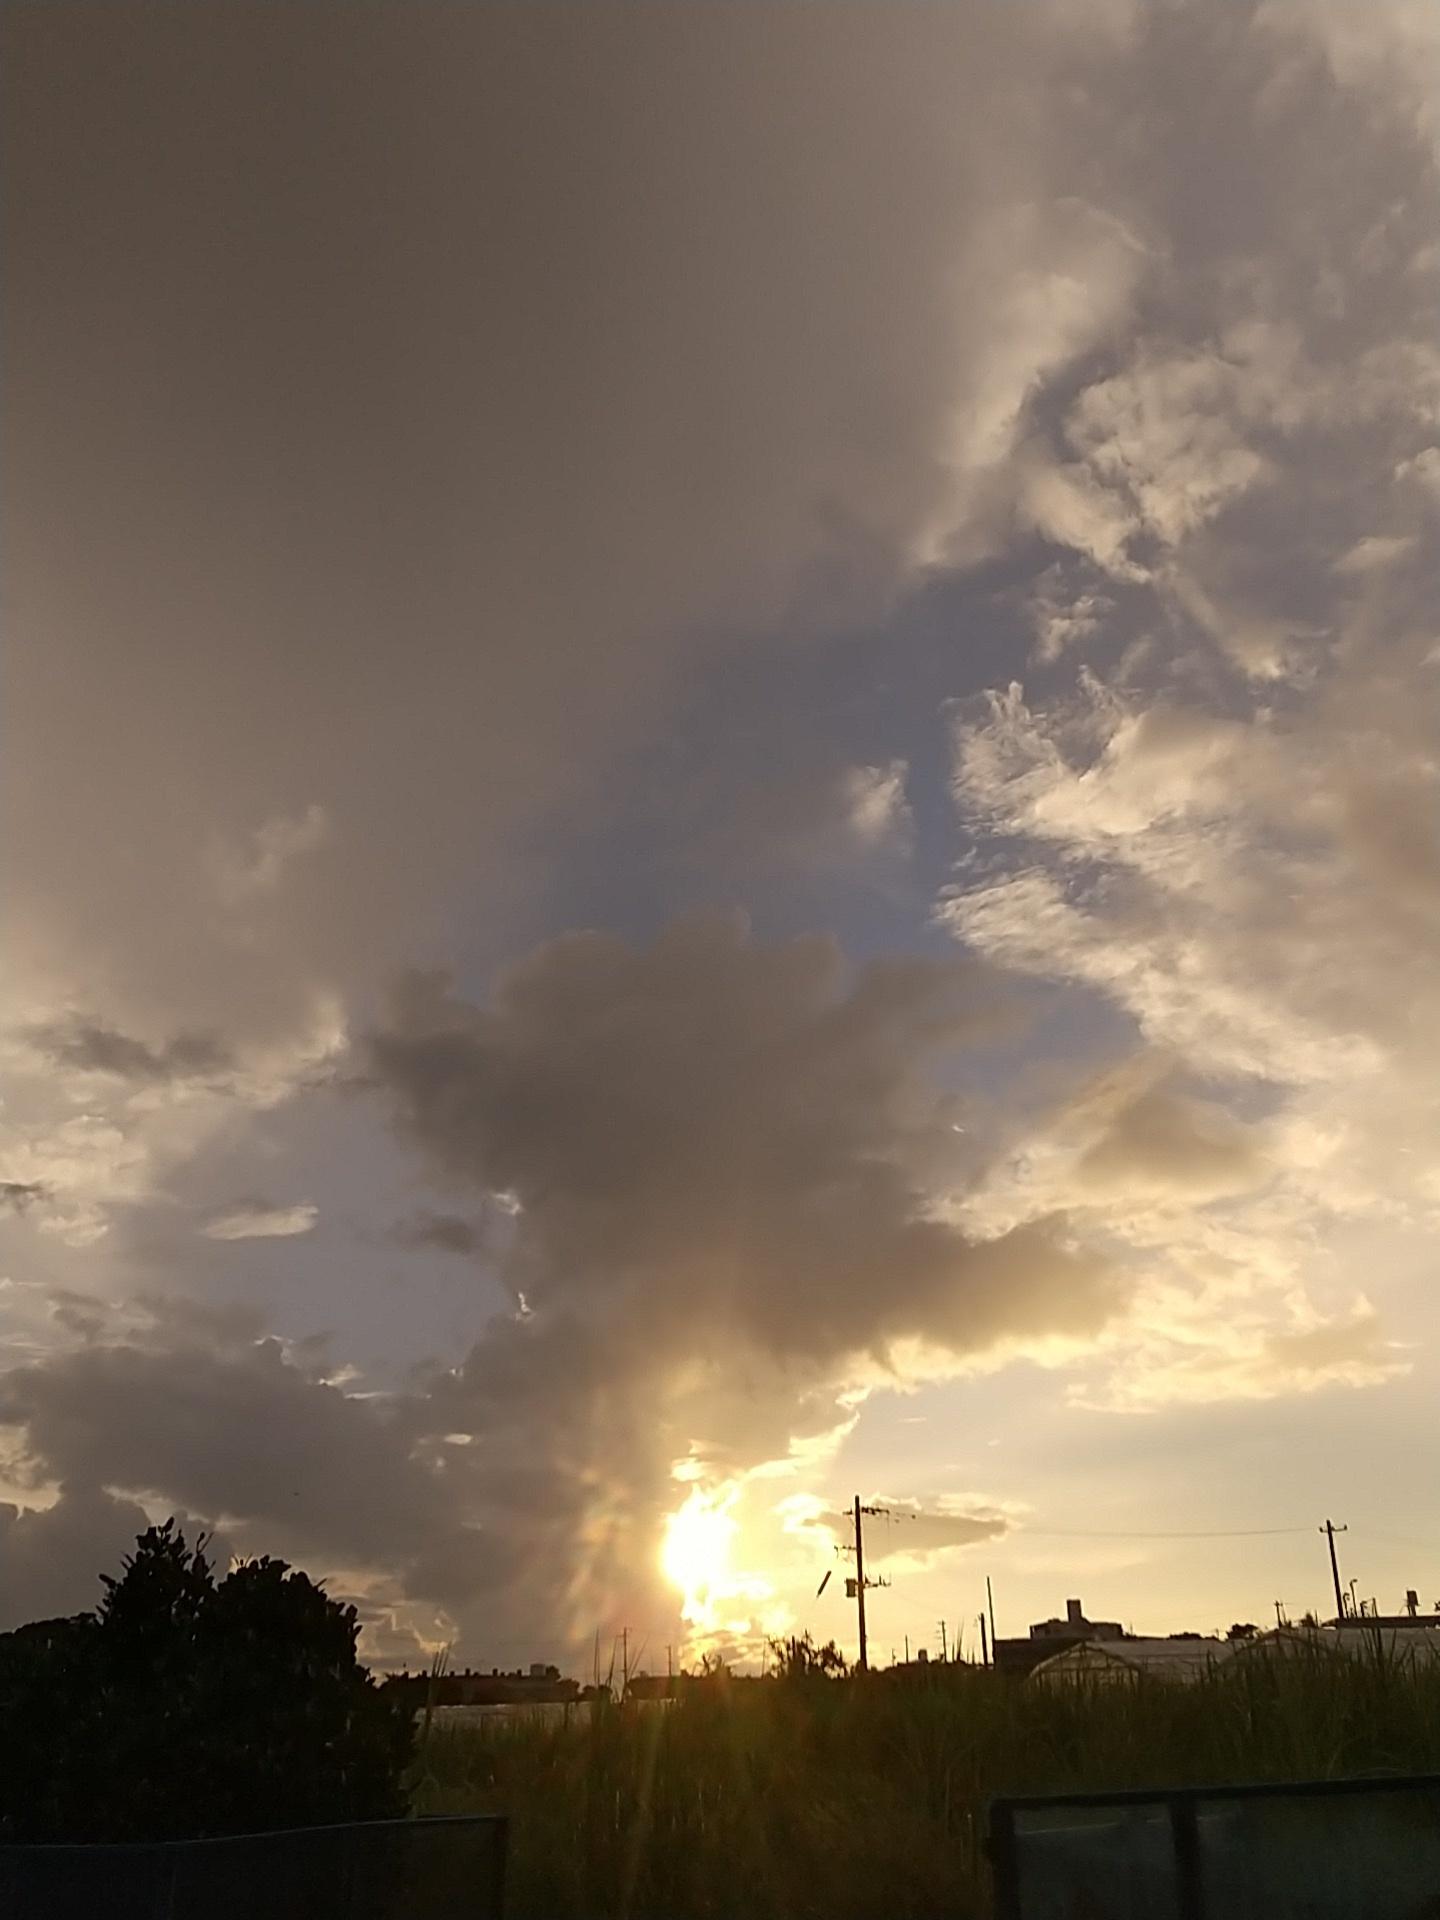 雲。虹。夕陽。夕焼け。_e0251855_19414728.jpg